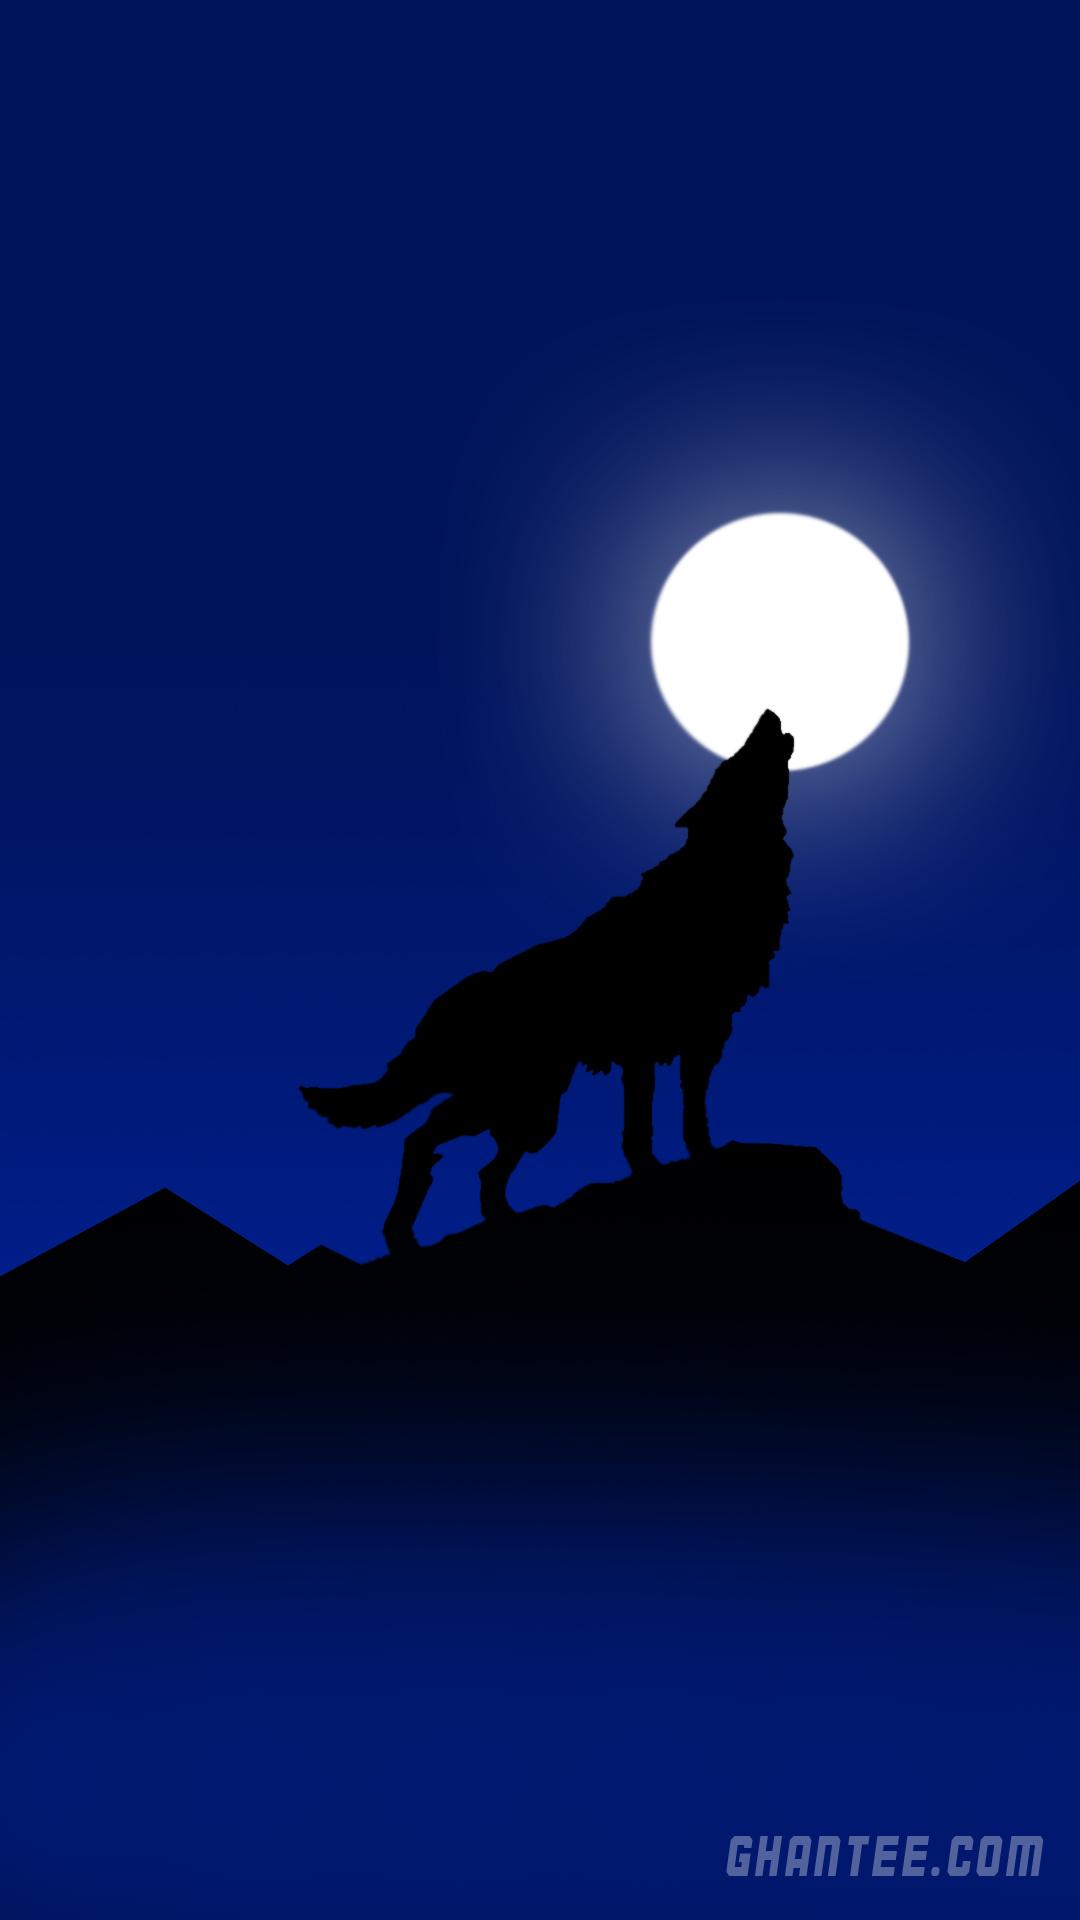 howling wolf hd phone wallpaper | 1080×1920